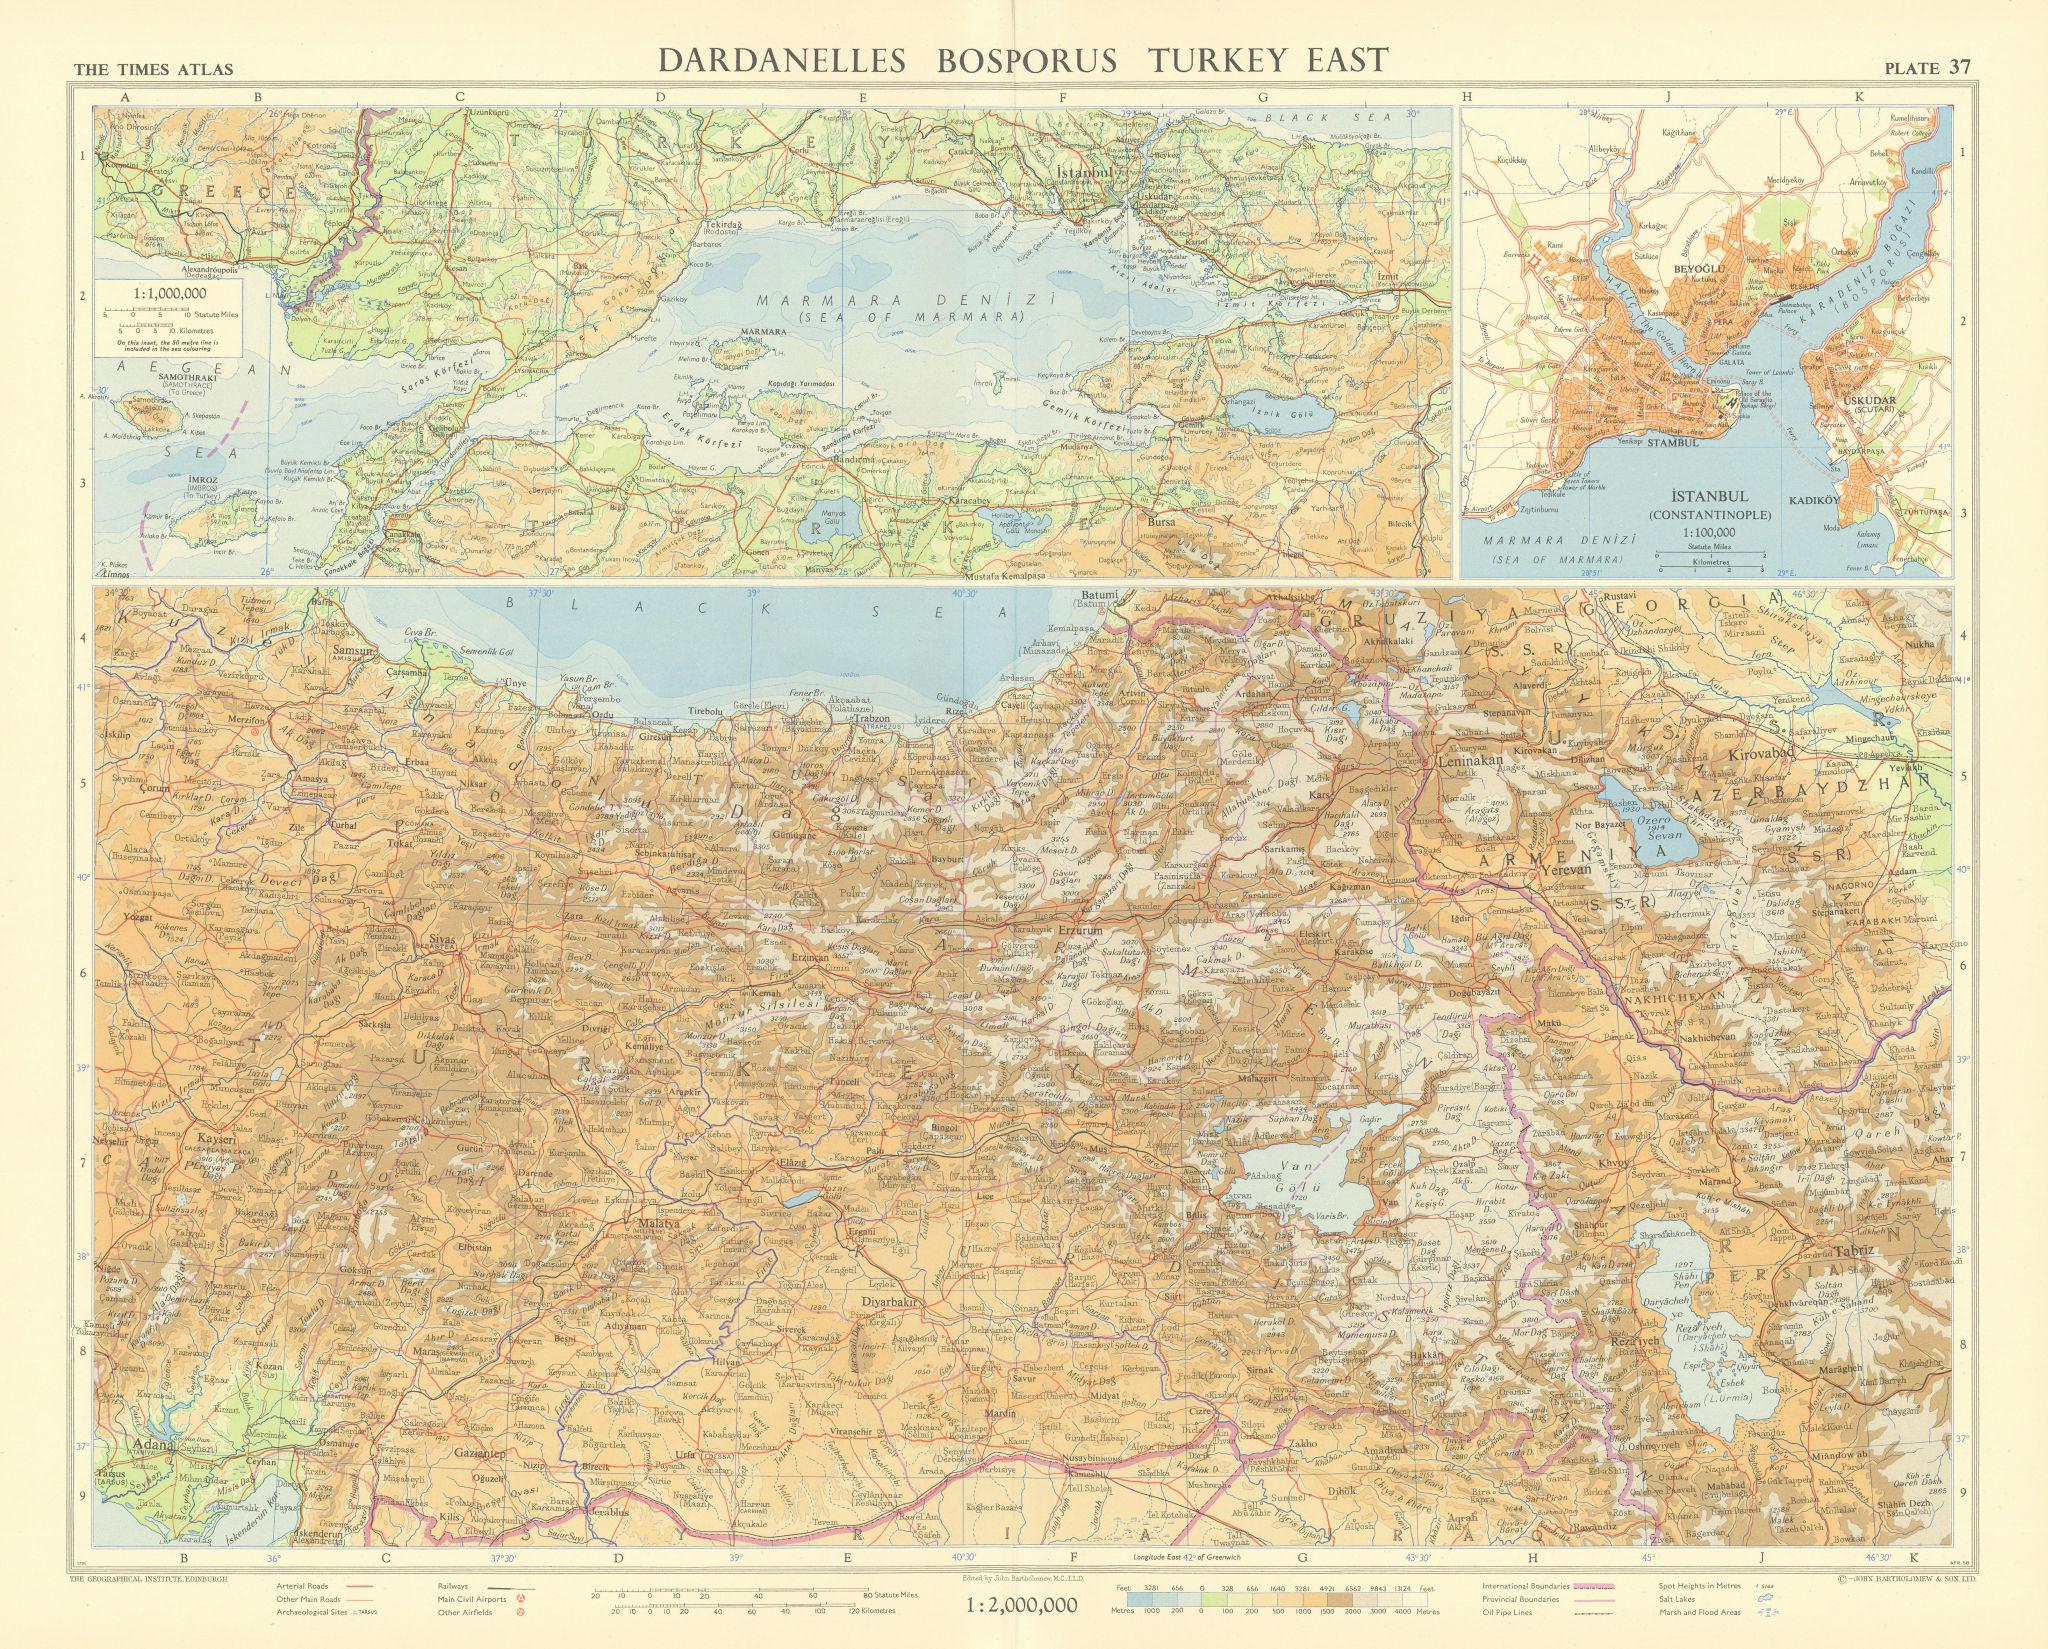 Eastern Turkey. Dardanelles. Bosphorus. Sea of Marmara. Istanbul. TIMES 1959 map